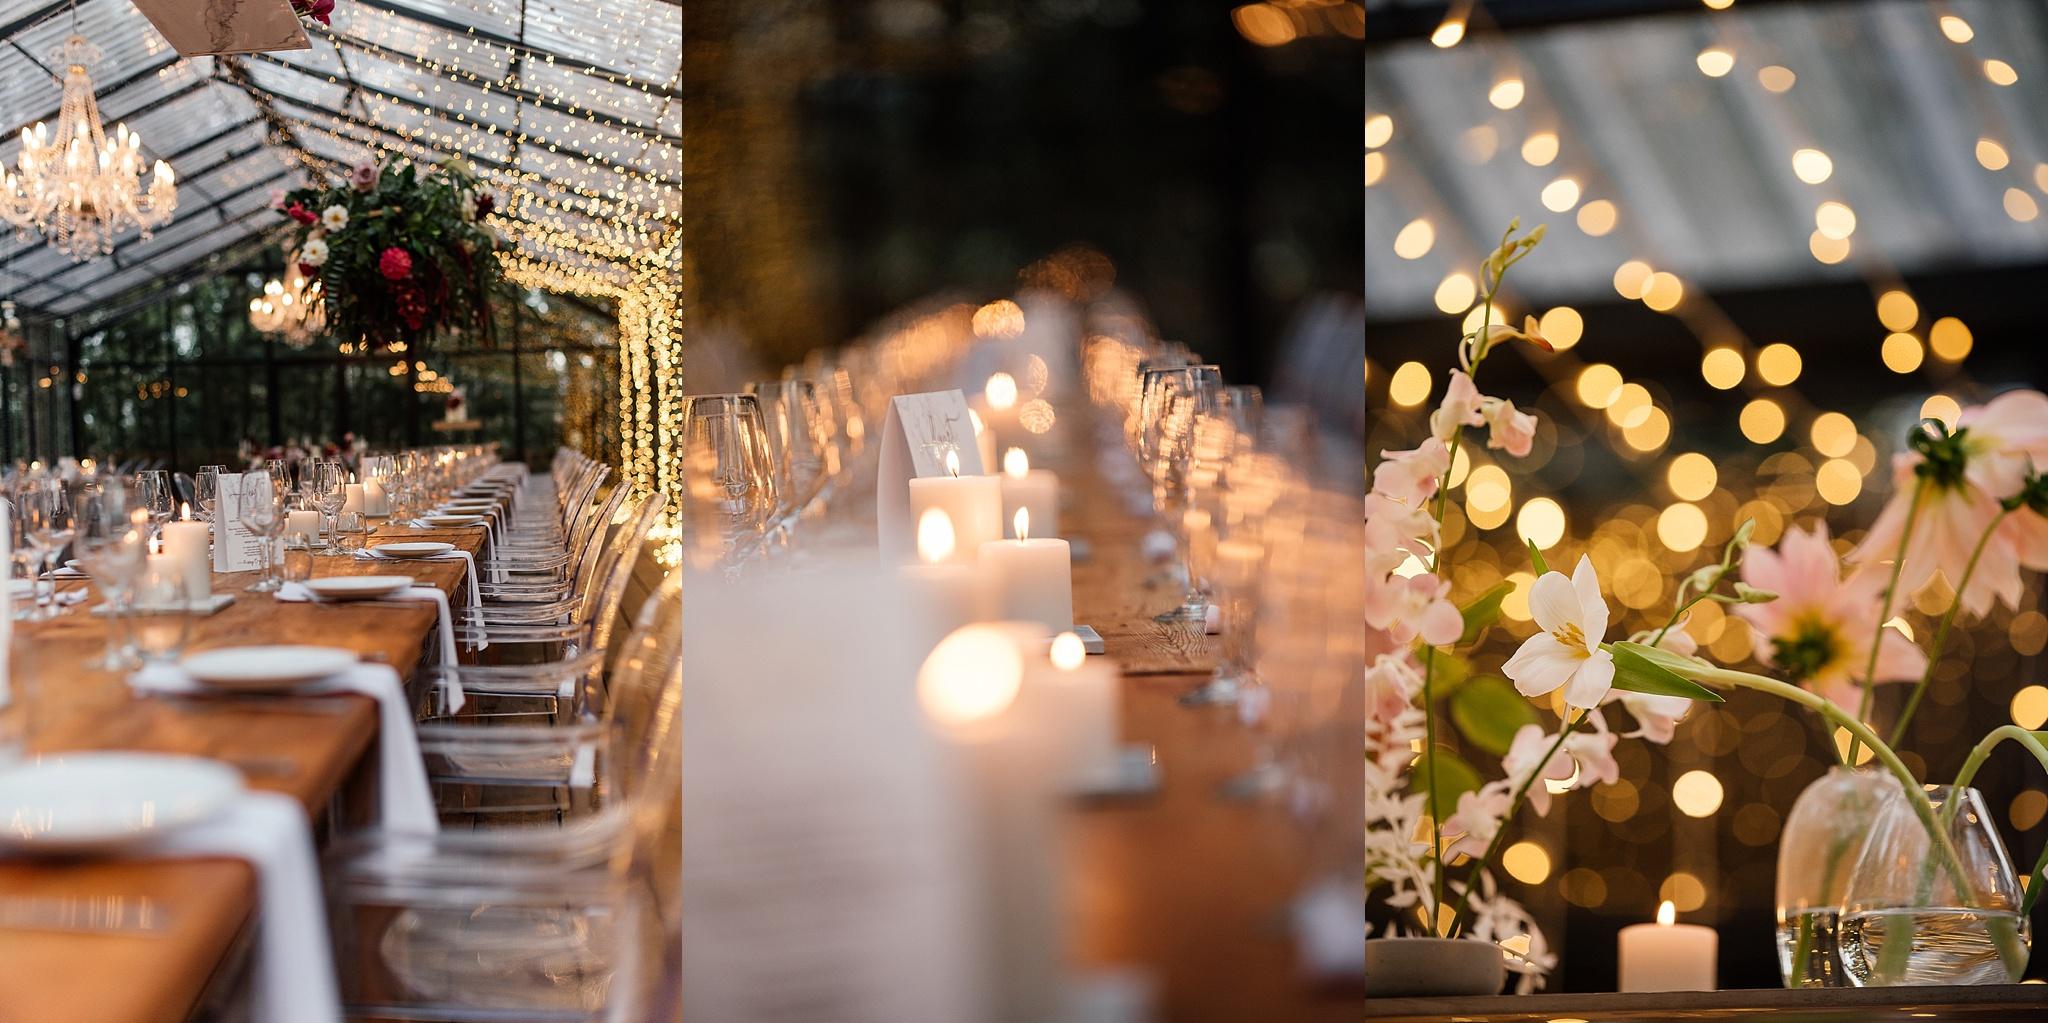 Cape Town Photographer Darren Bester - Die Woud Wedding - Gareth & Roxanne_0045.jpg